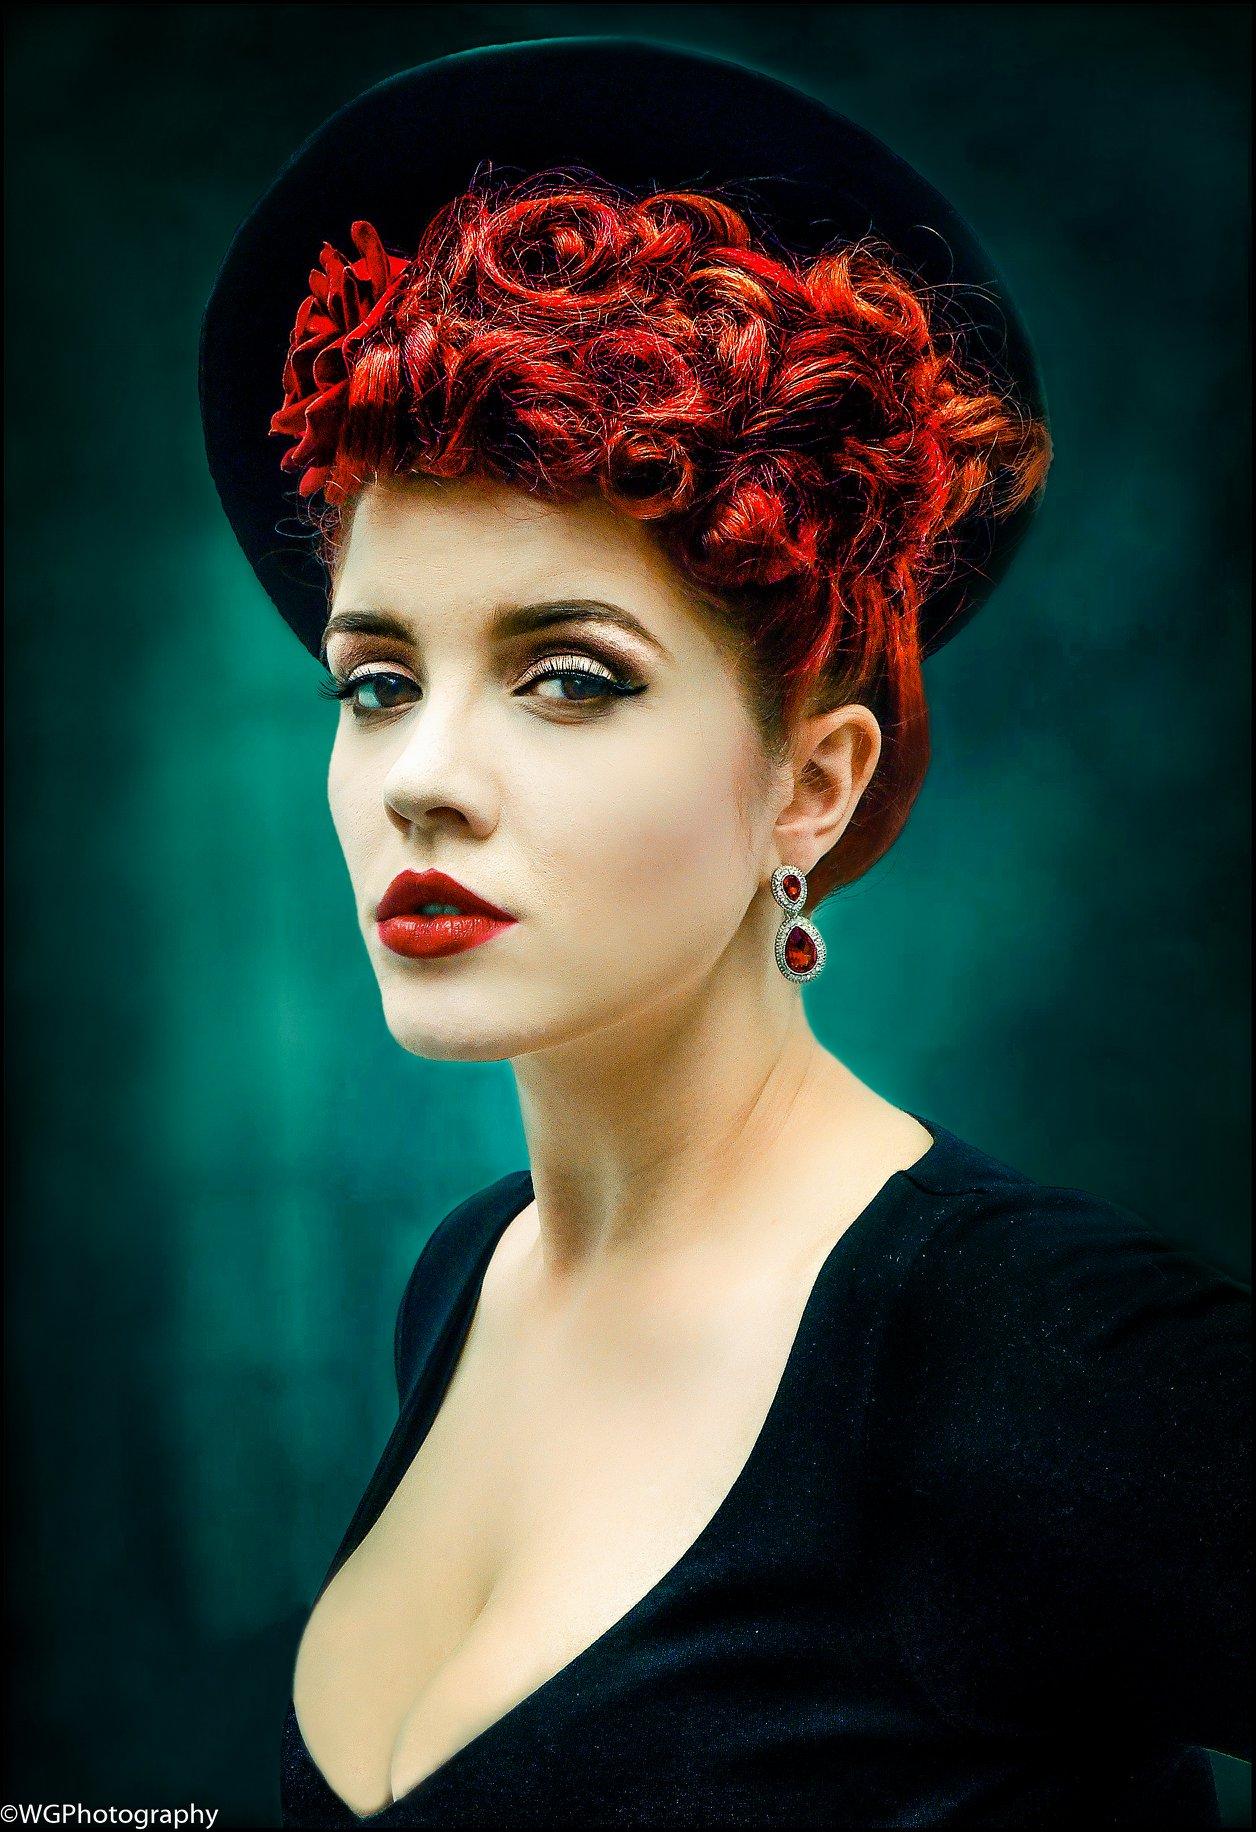 <h5>Scarlet</h5><p>Colour print by William Glen</p>